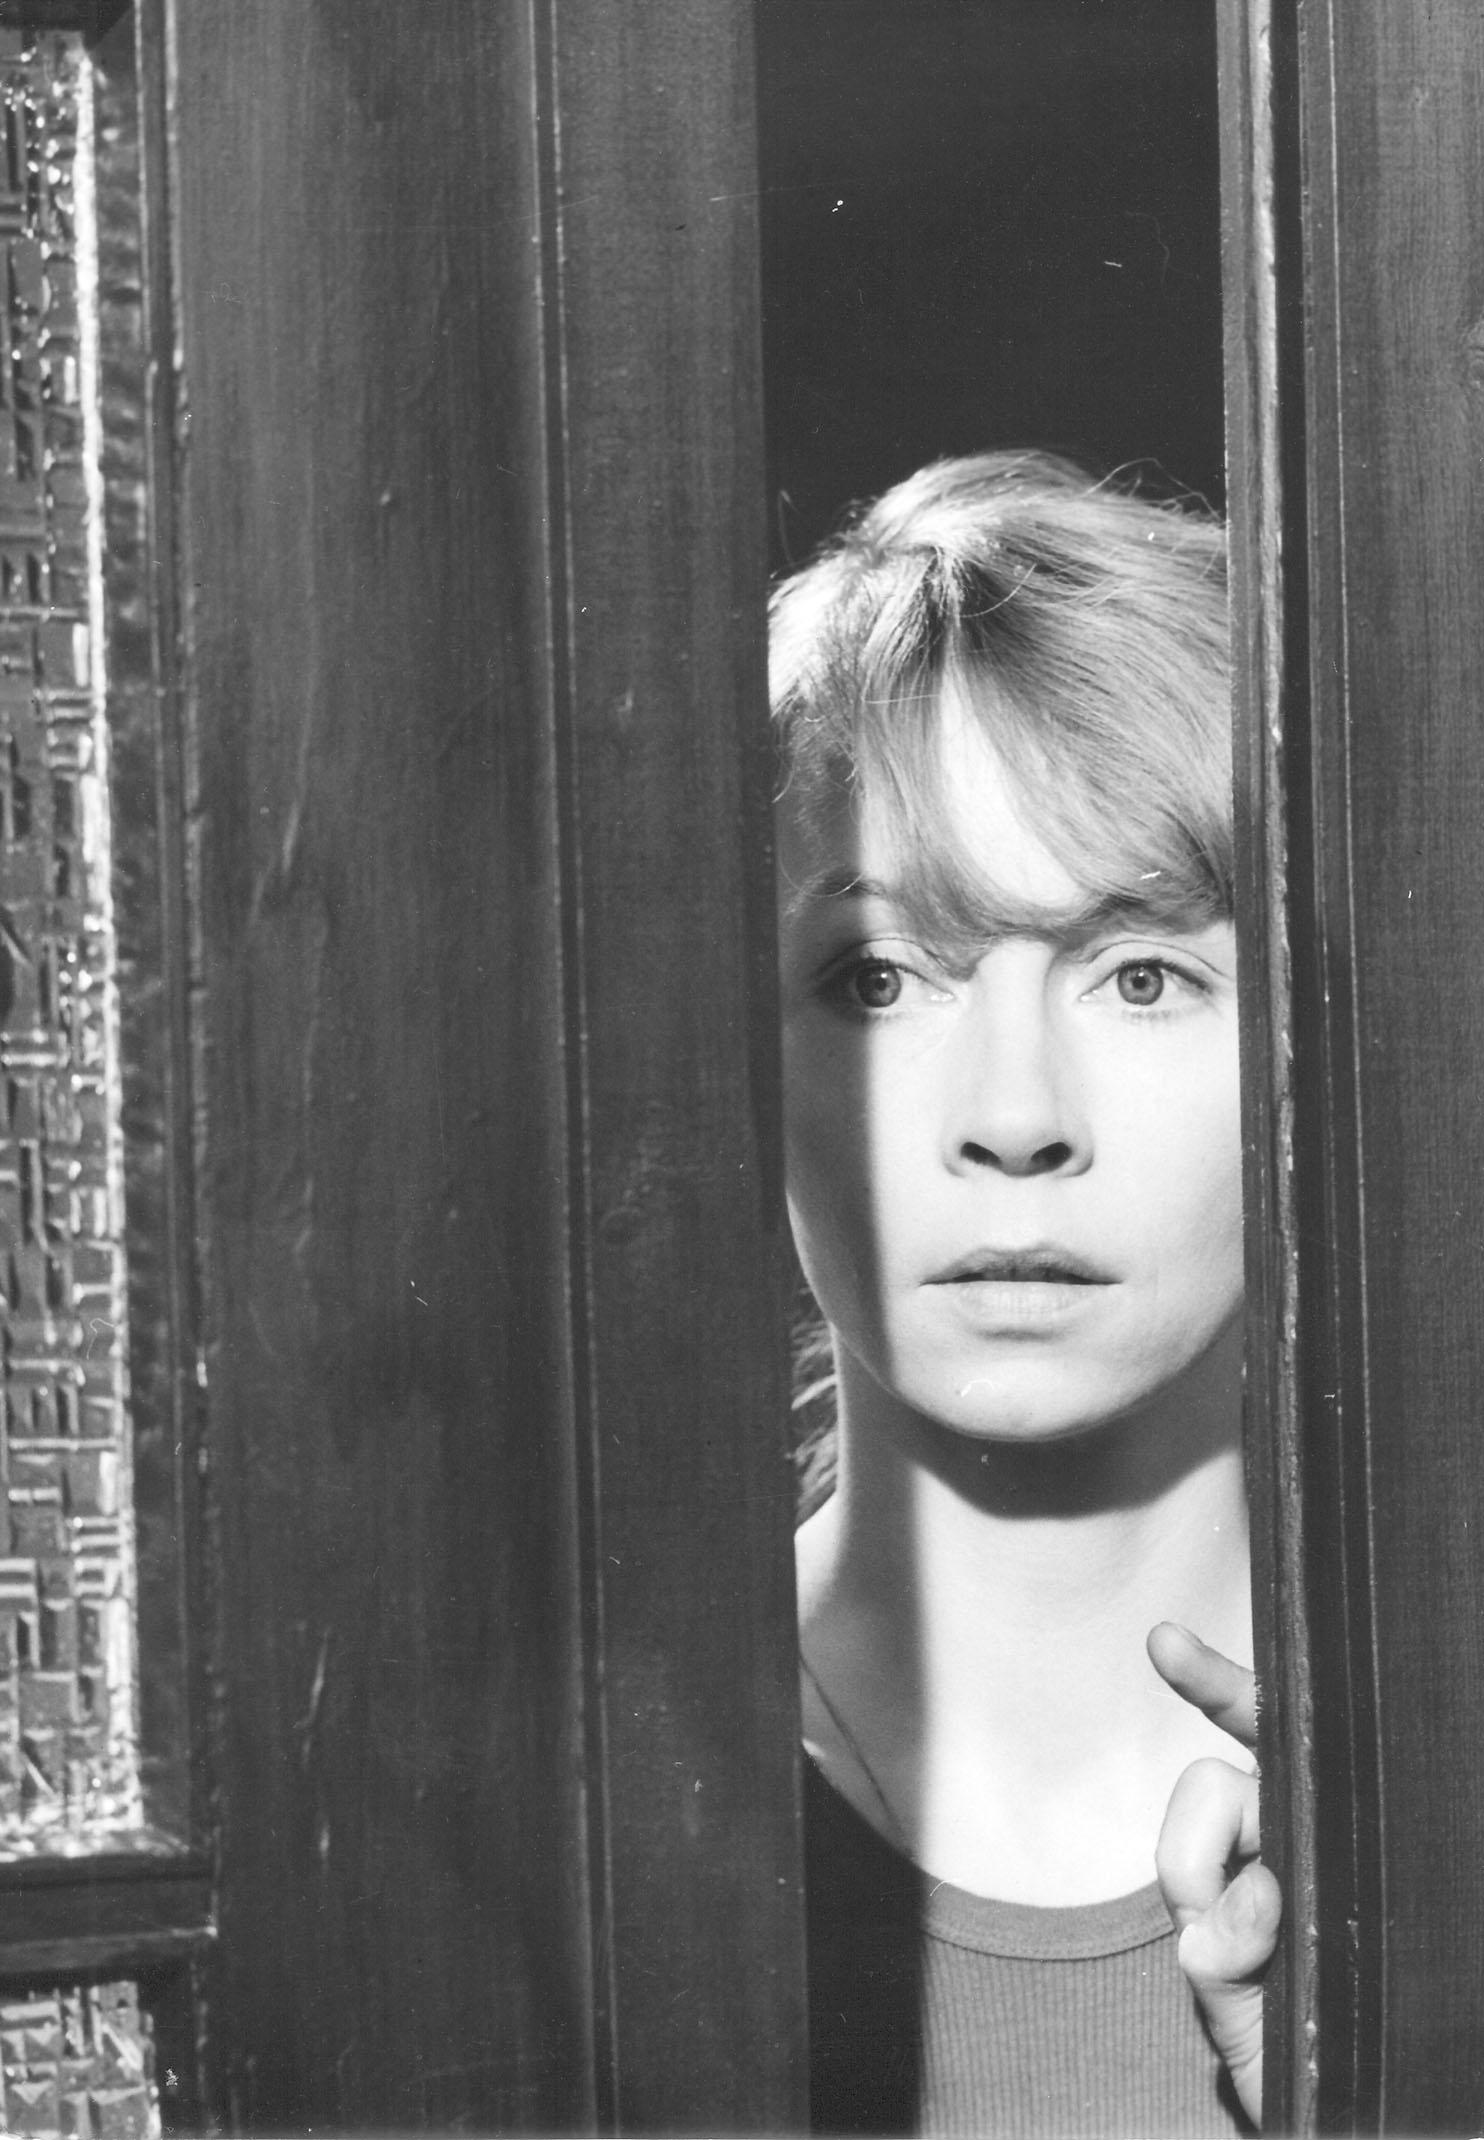 Das Versteck Jutta Hoffmann Waltraut Pathenheimer Film Kino